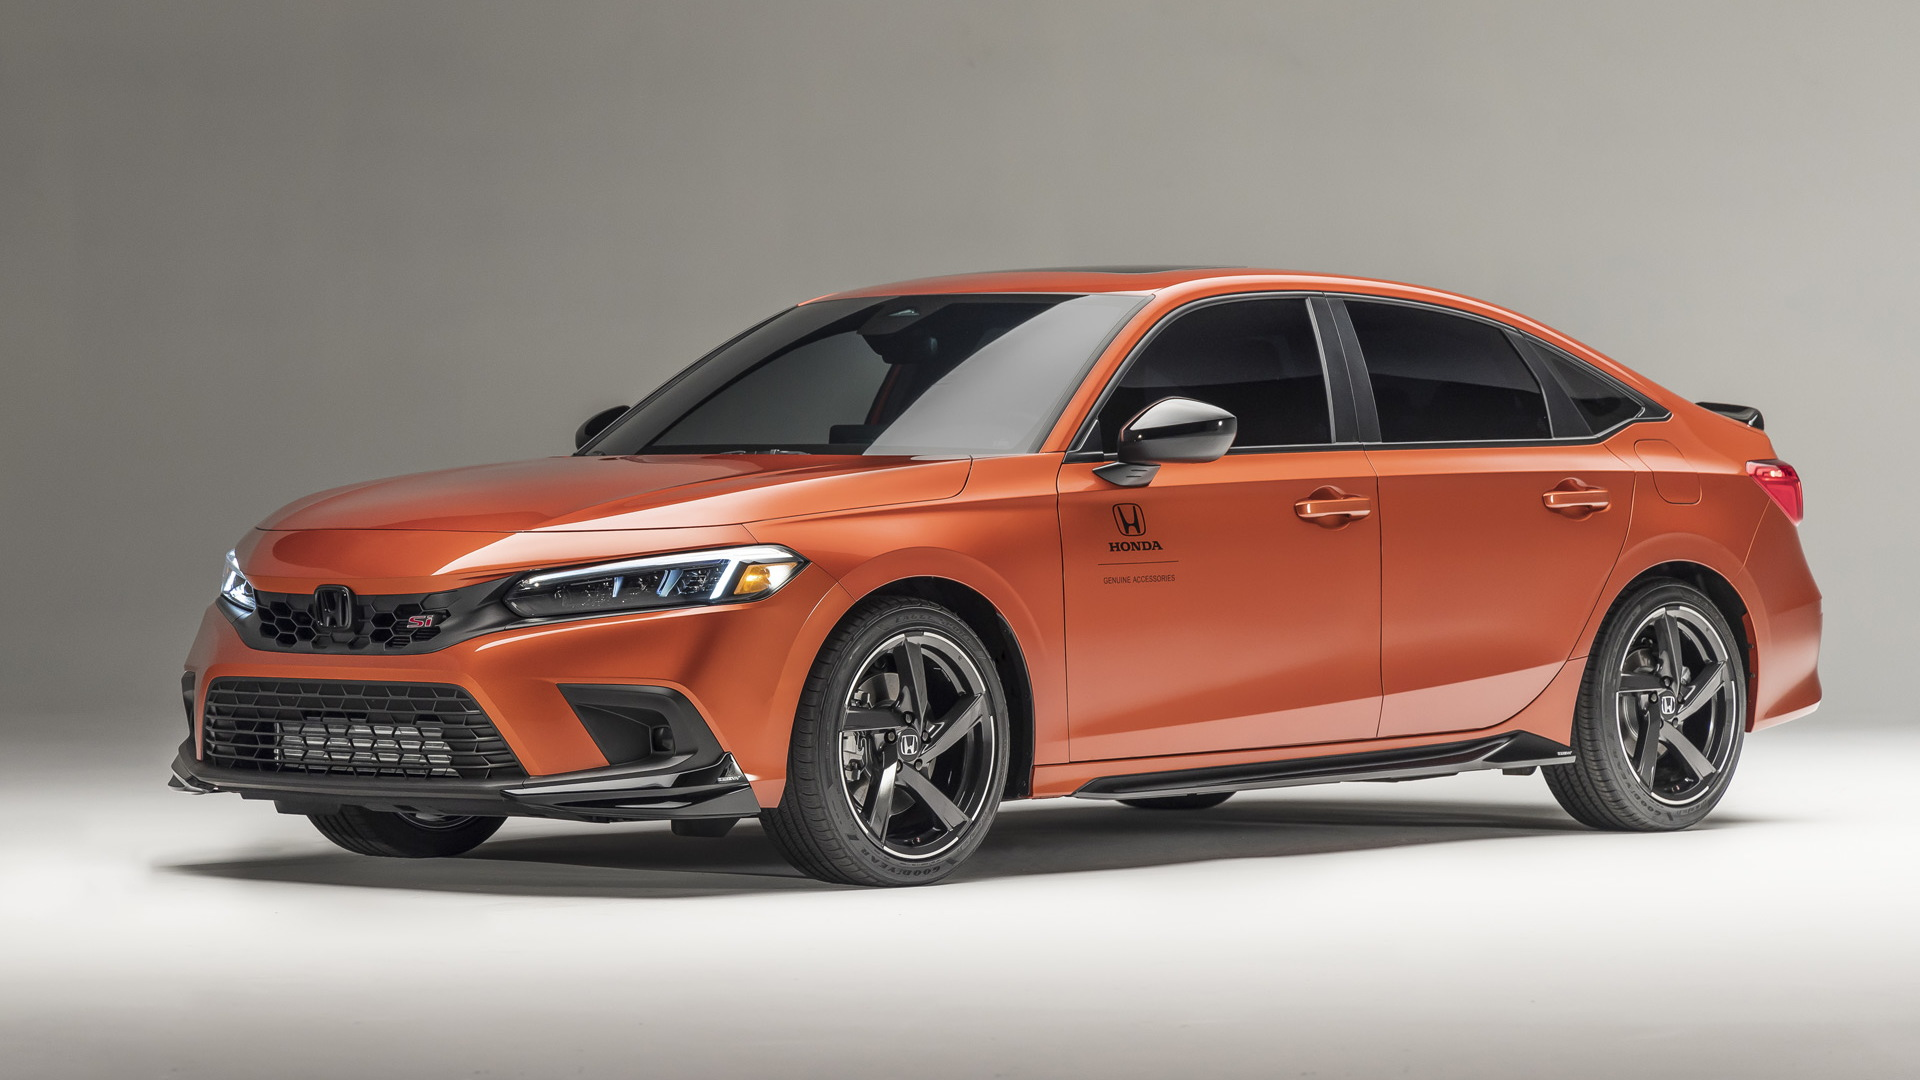 HPD 2022 Honda Civic Si - 2021 SEMA show